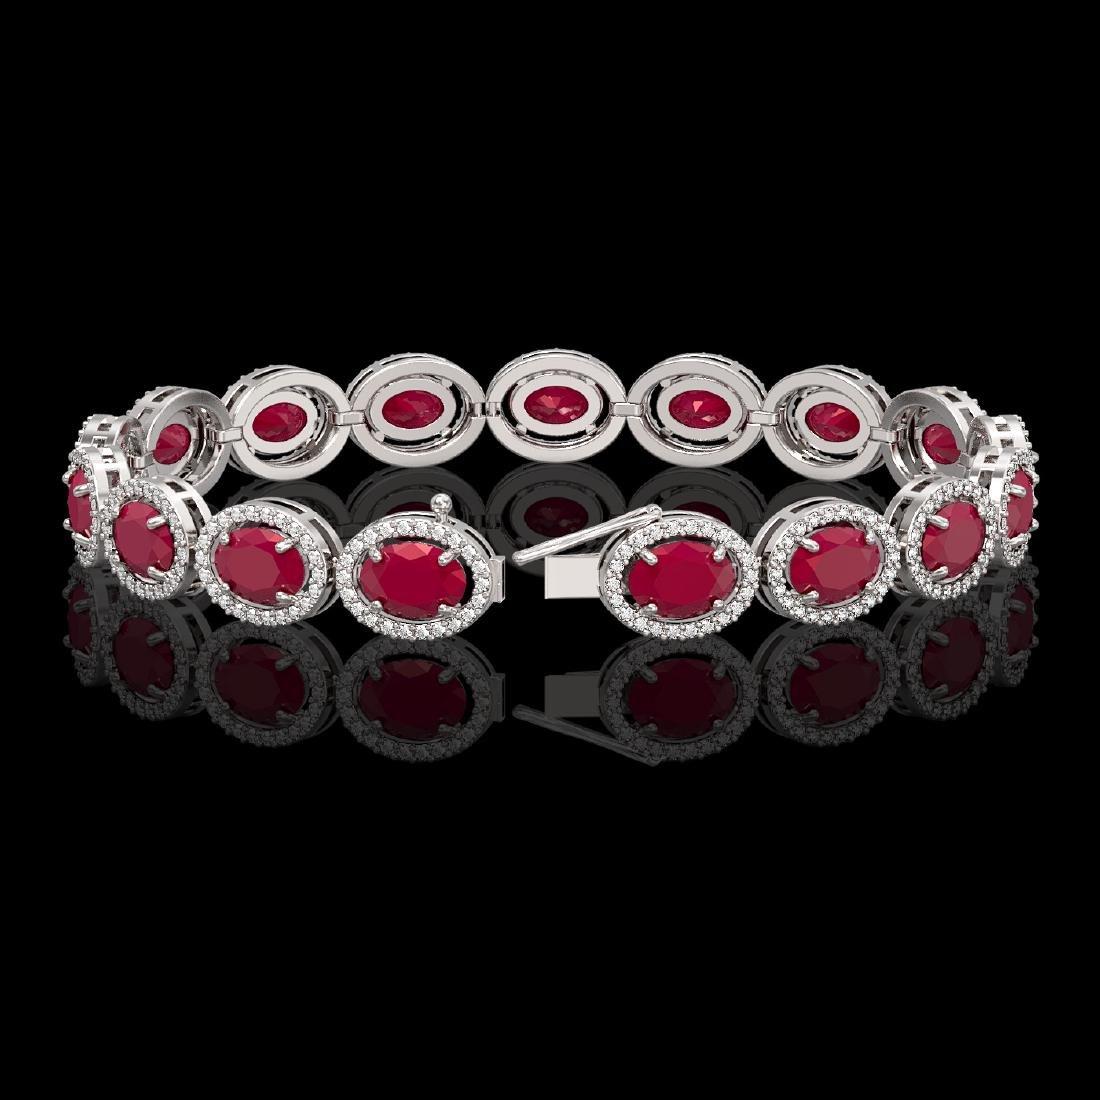 22.89 CTW Ruby & Diamond Halo Bracelet 10K White Gold - 2